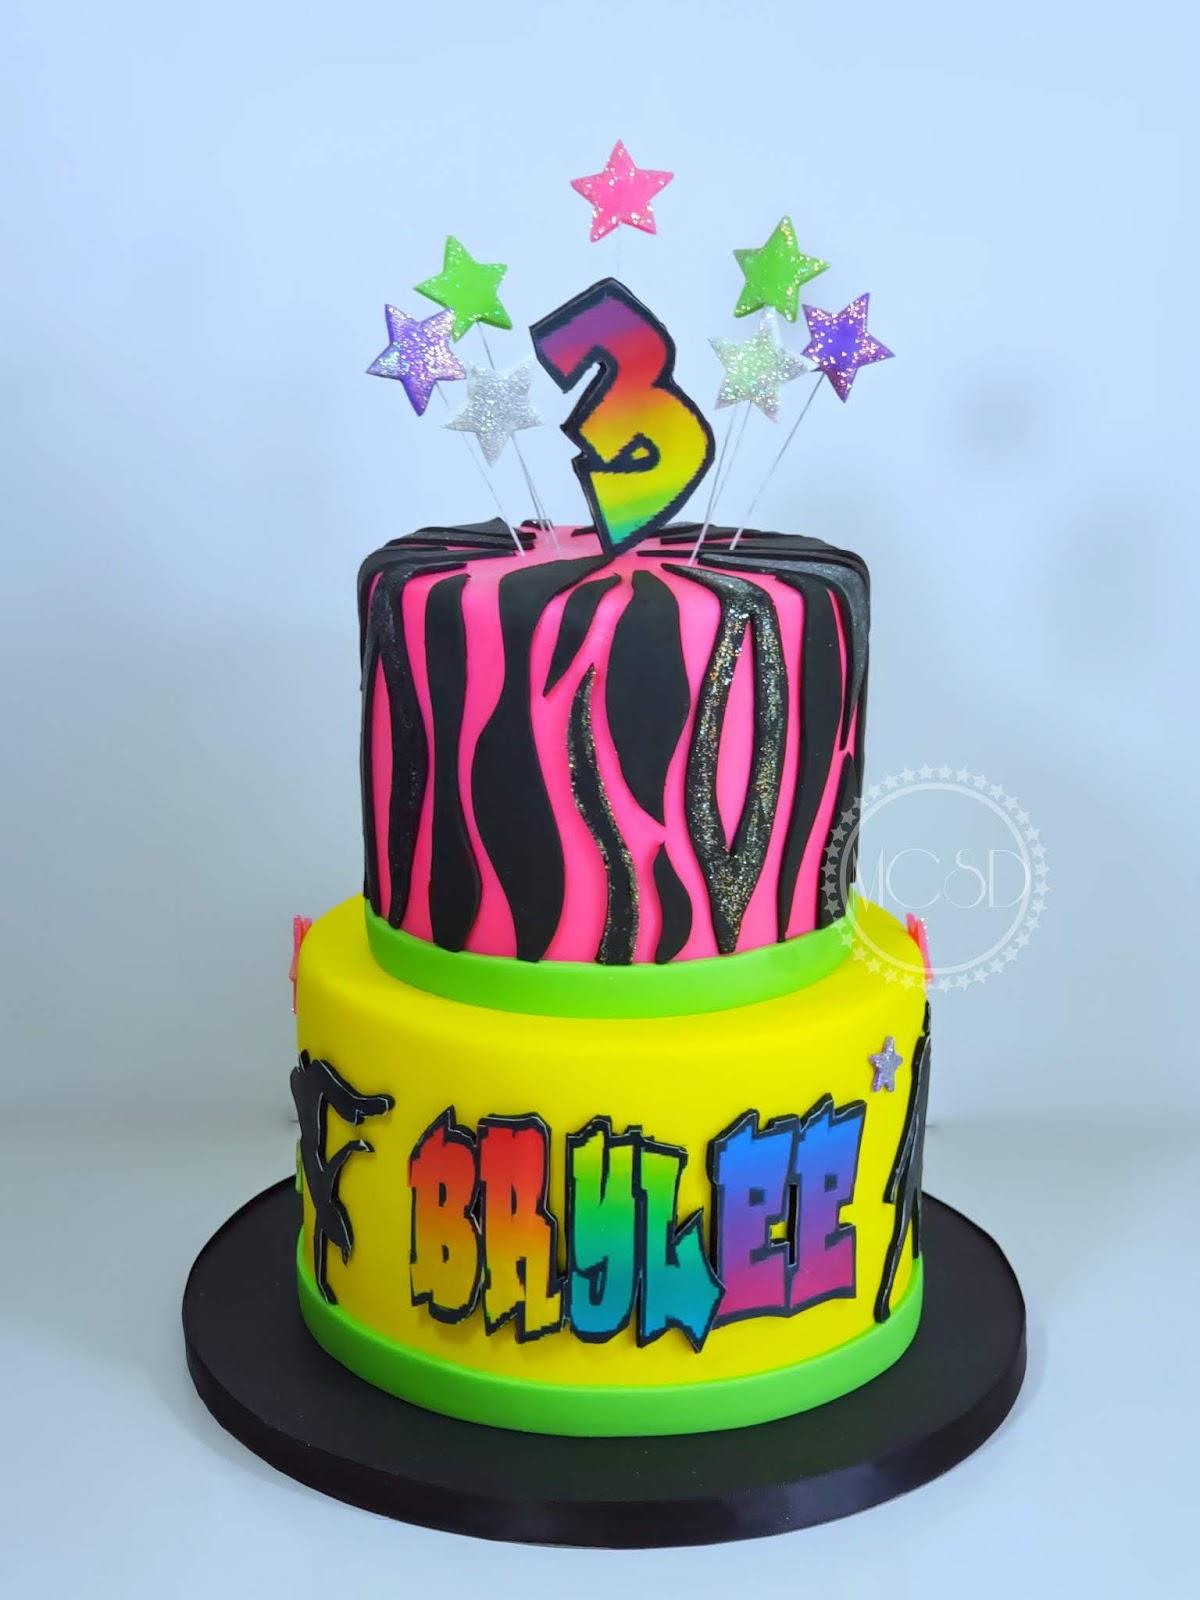 Super Cakesbyzana Hip Hop Themed Birthday Cake Funny Birthday Cards Online Inifodamsfinfo